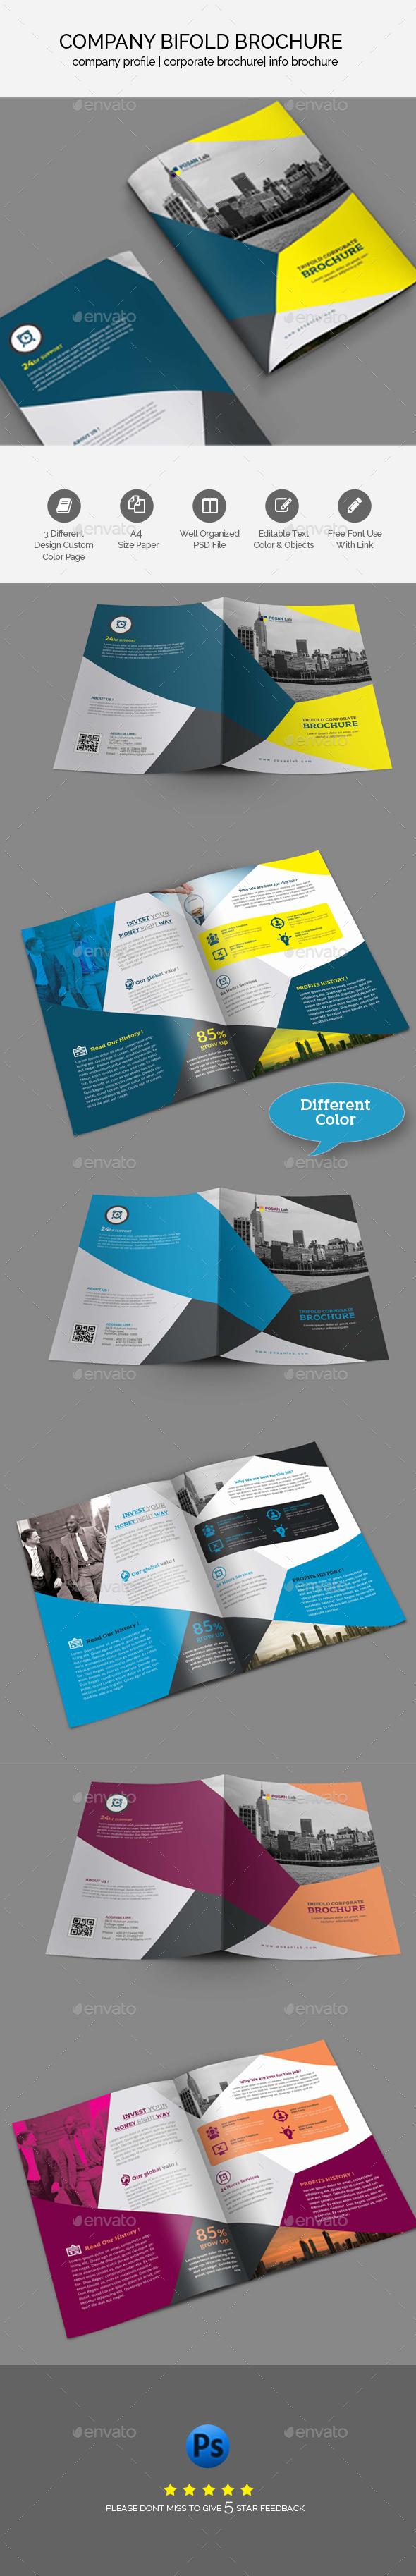 Bifold Business Brochure Template - Brochures Print Templates